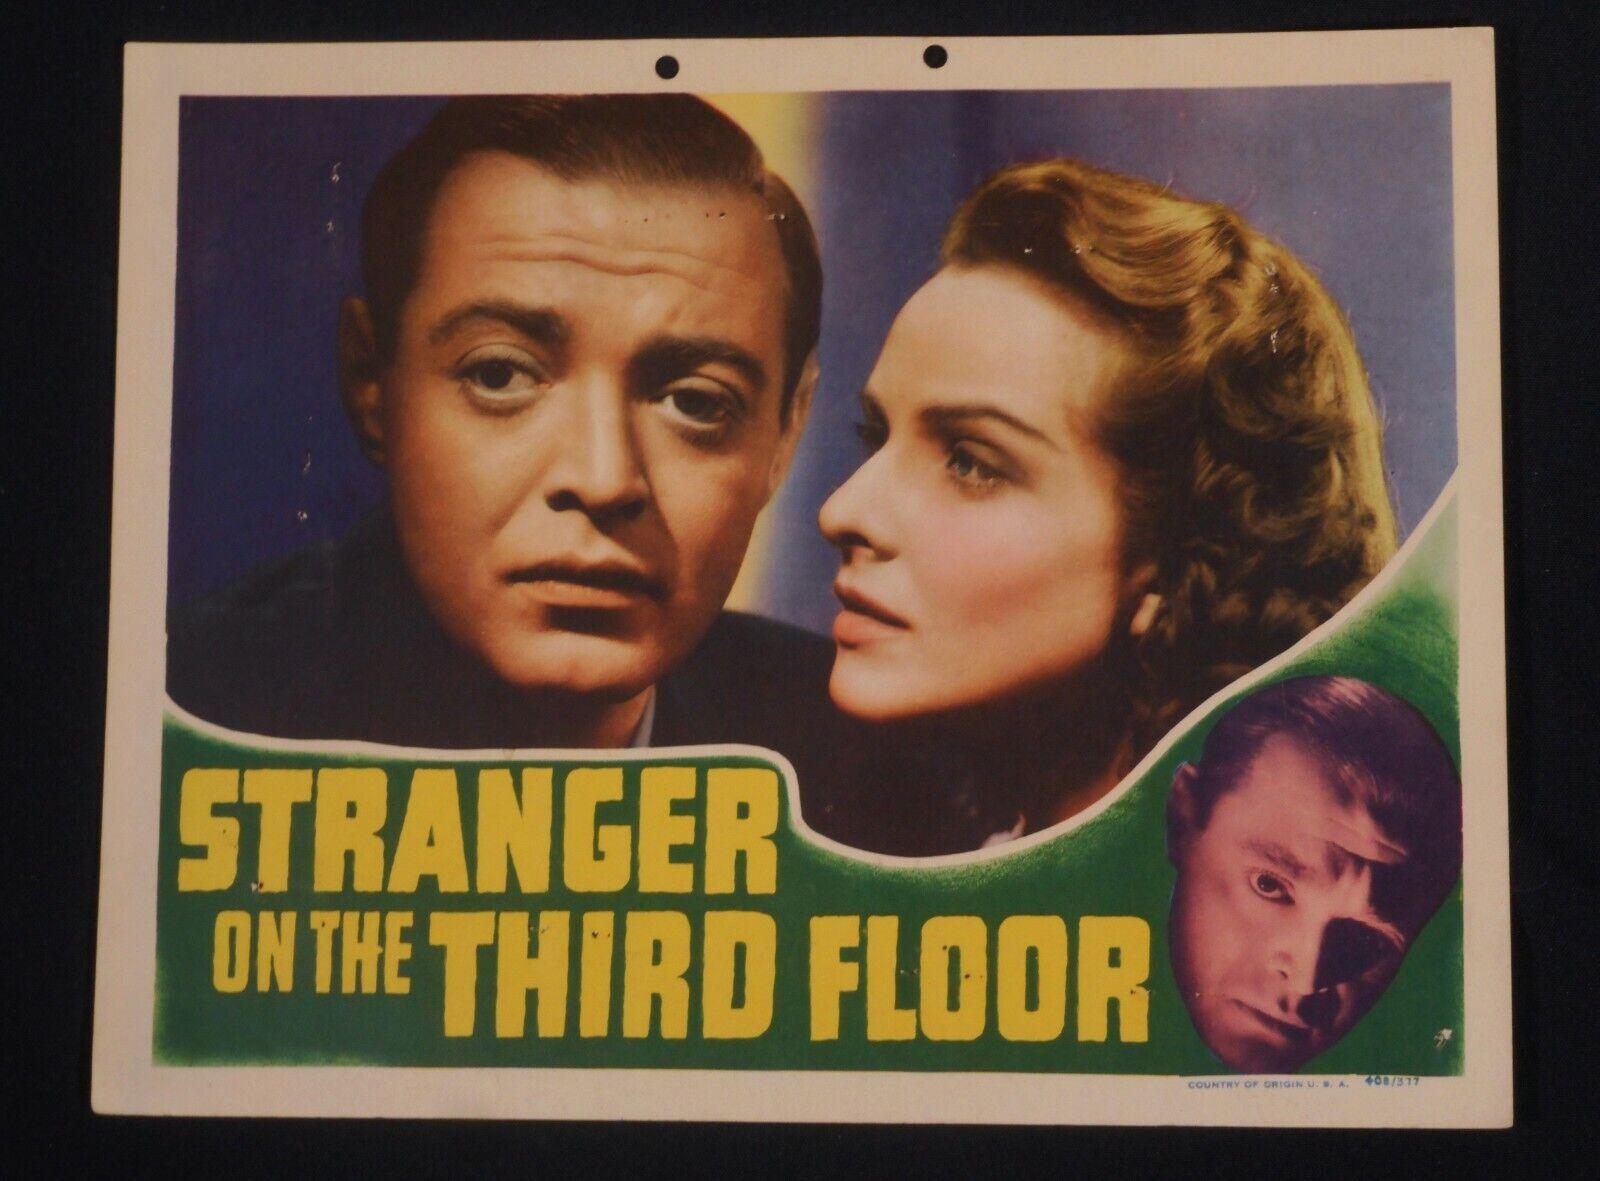 STRANGER ON THE THIRD FLOOR 1940 PETER LORRE RARE FILM-NOIR LOBBY CARD  - $349.95